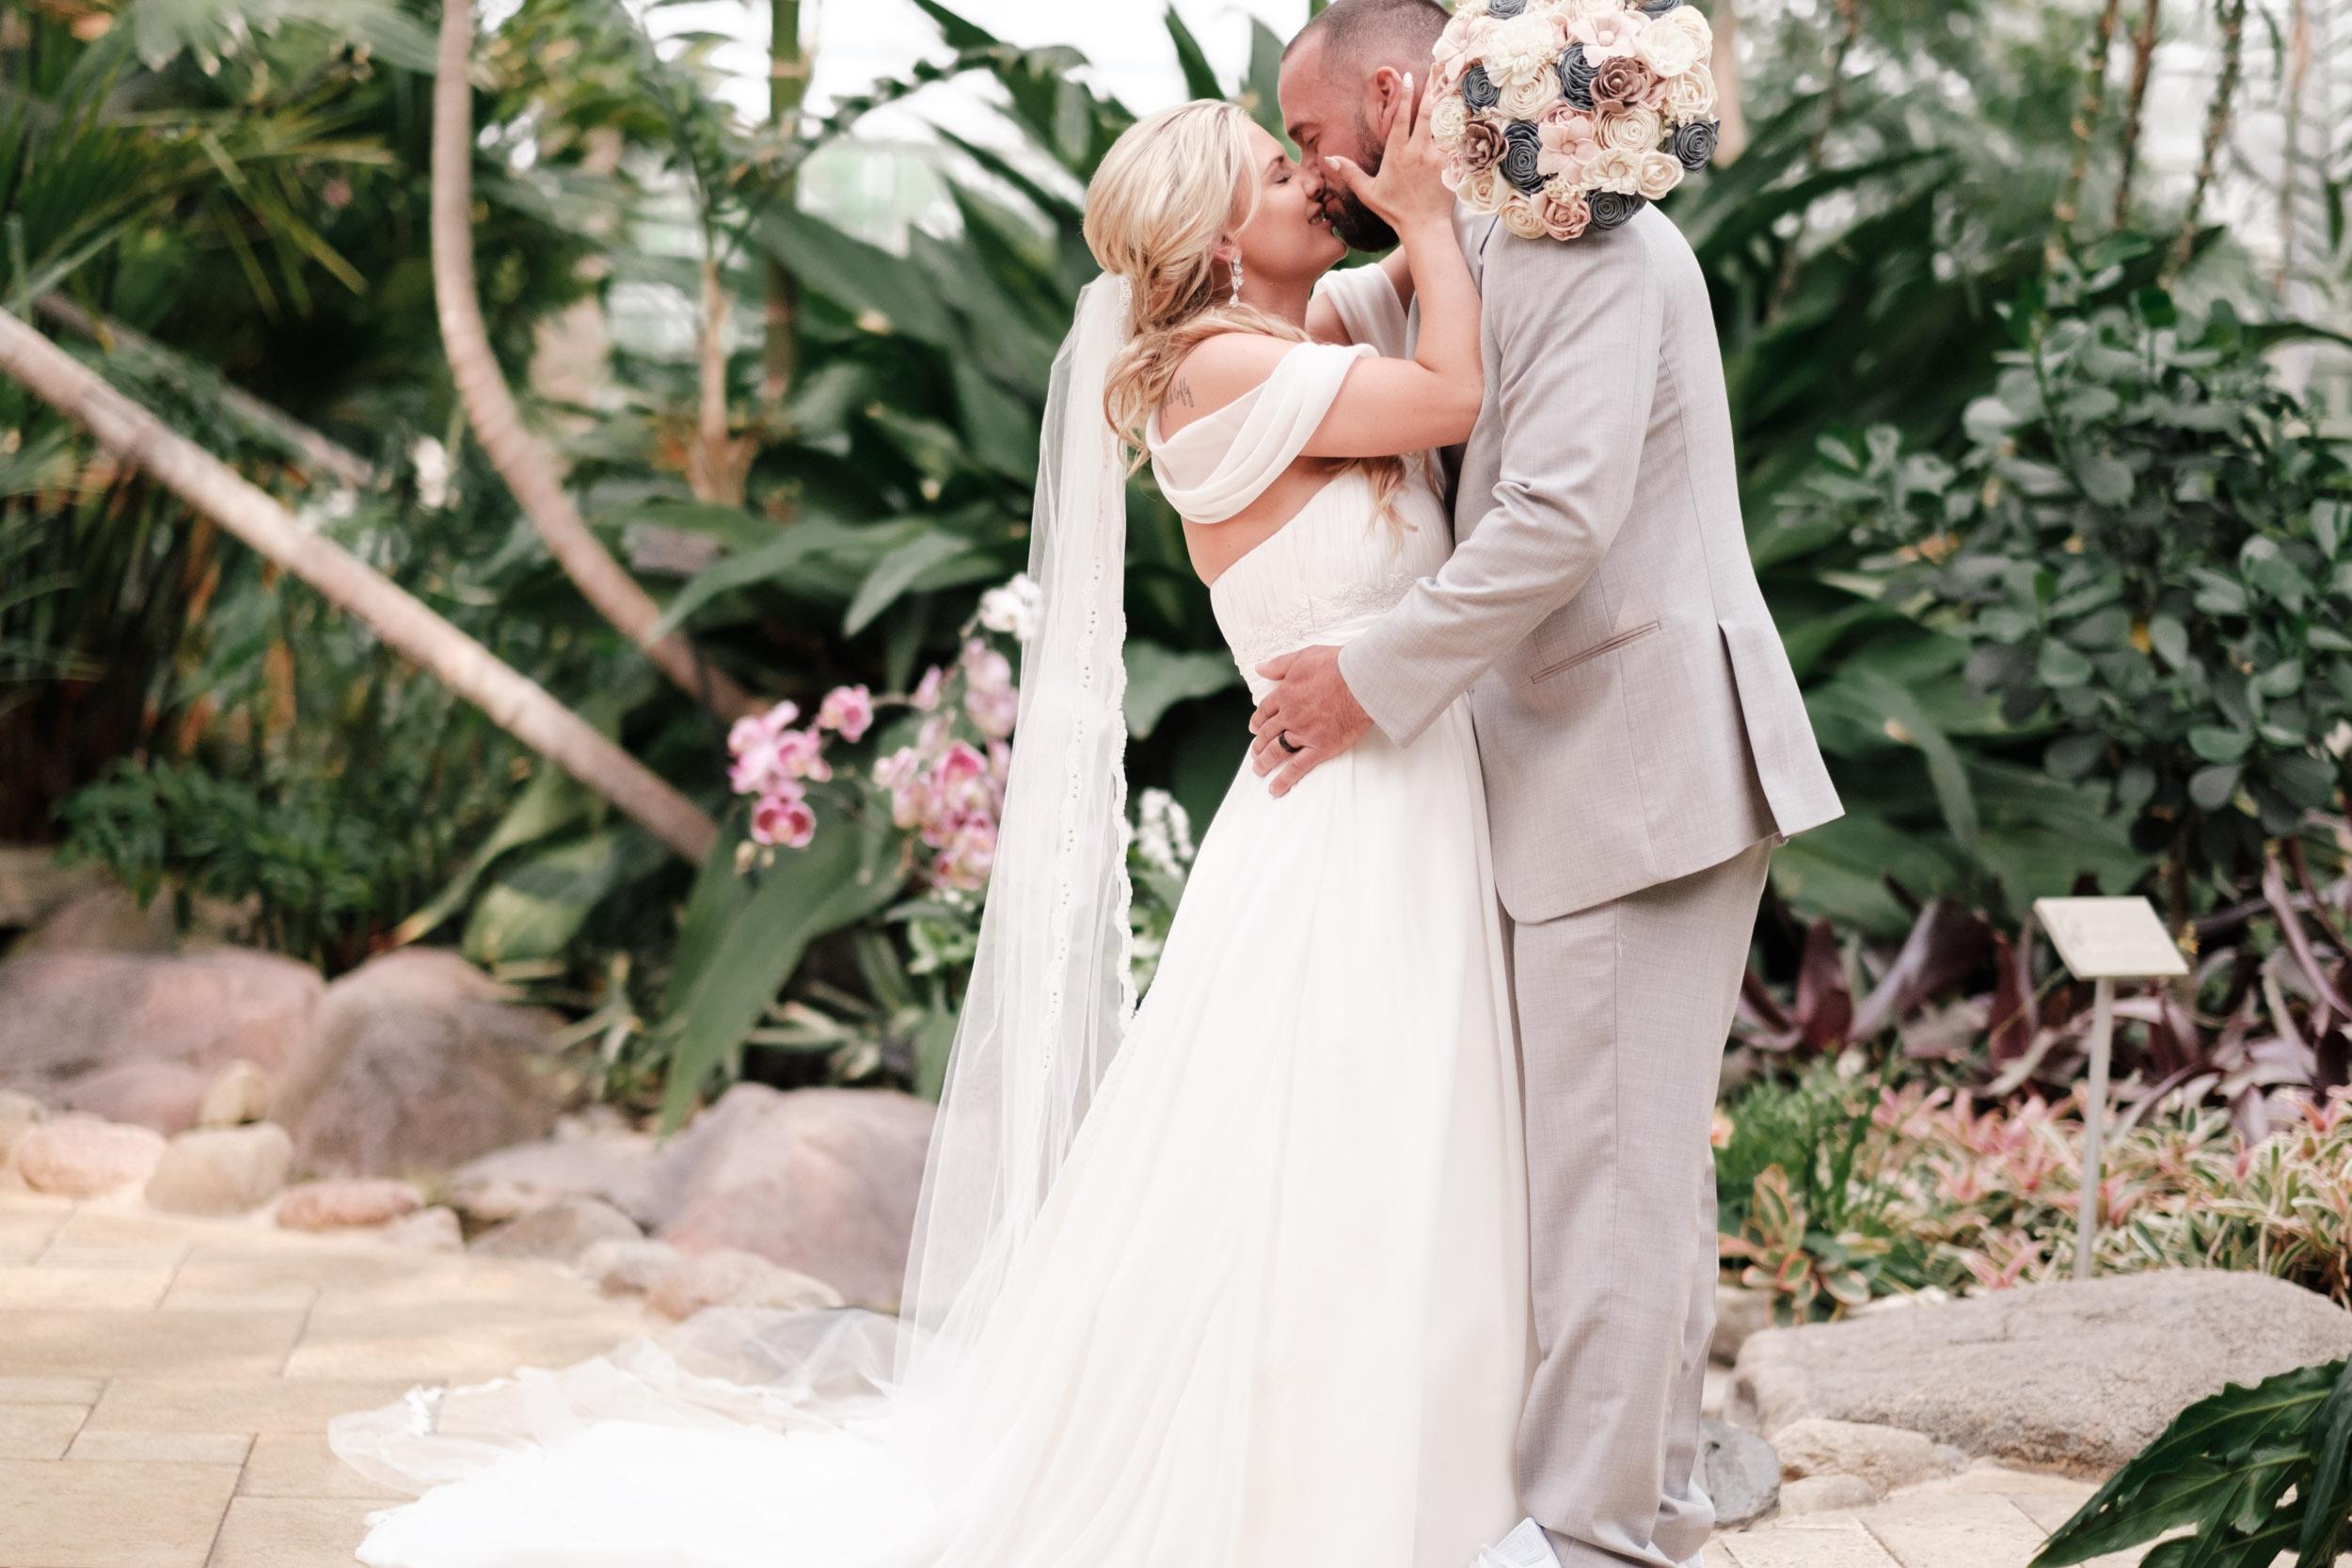 19-06-01 Megan Josh - Nicholas Conservatory Wedding-33.jpg